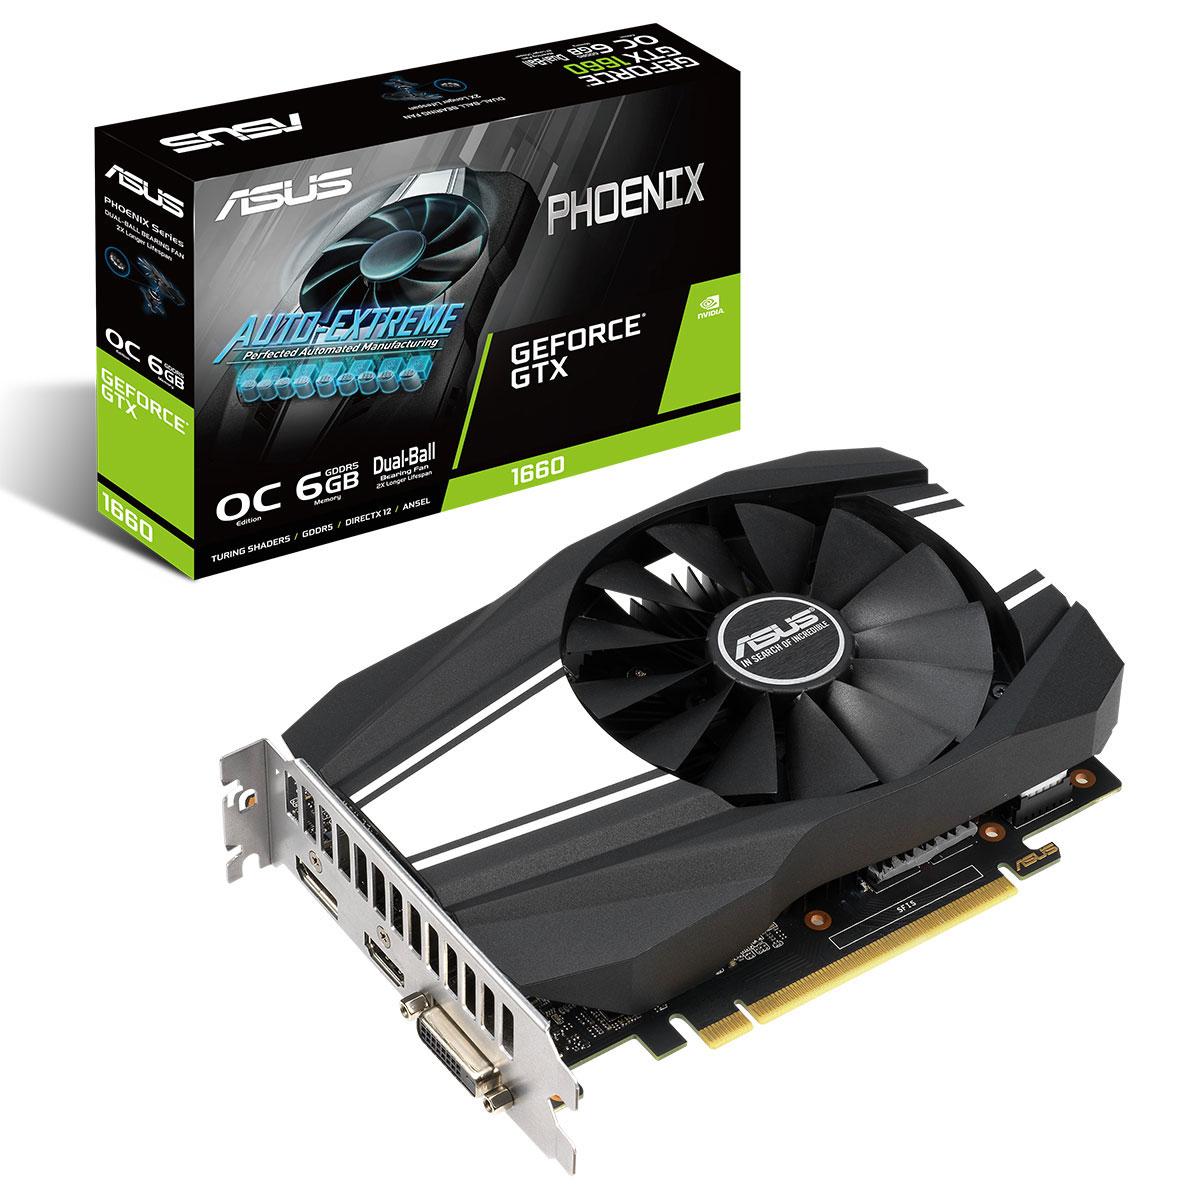 Carte graphique ASUS GeForce GTX 1660 PH-GTX1660-O6G 6 Go GDDR5 - HDMI/DisplayPort/DVI - PCI Express (NVIDIA GeForce GTX 1660)